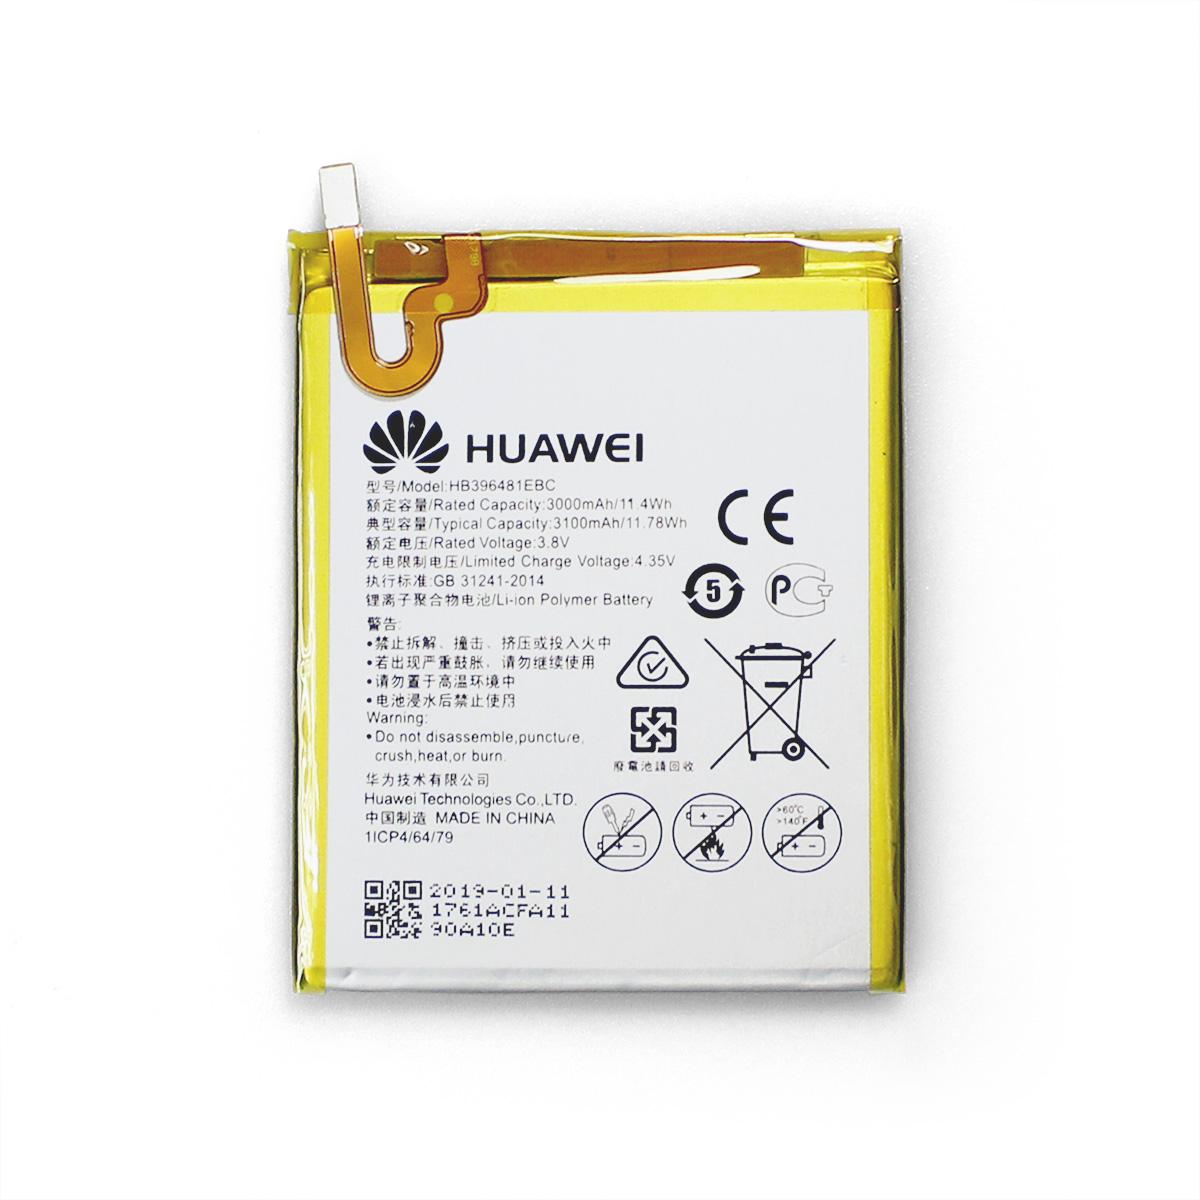 Huawei HONOR 5X G8 RIO L03 -UL00/TL00 HB396481EBC Original Battery Wholesale